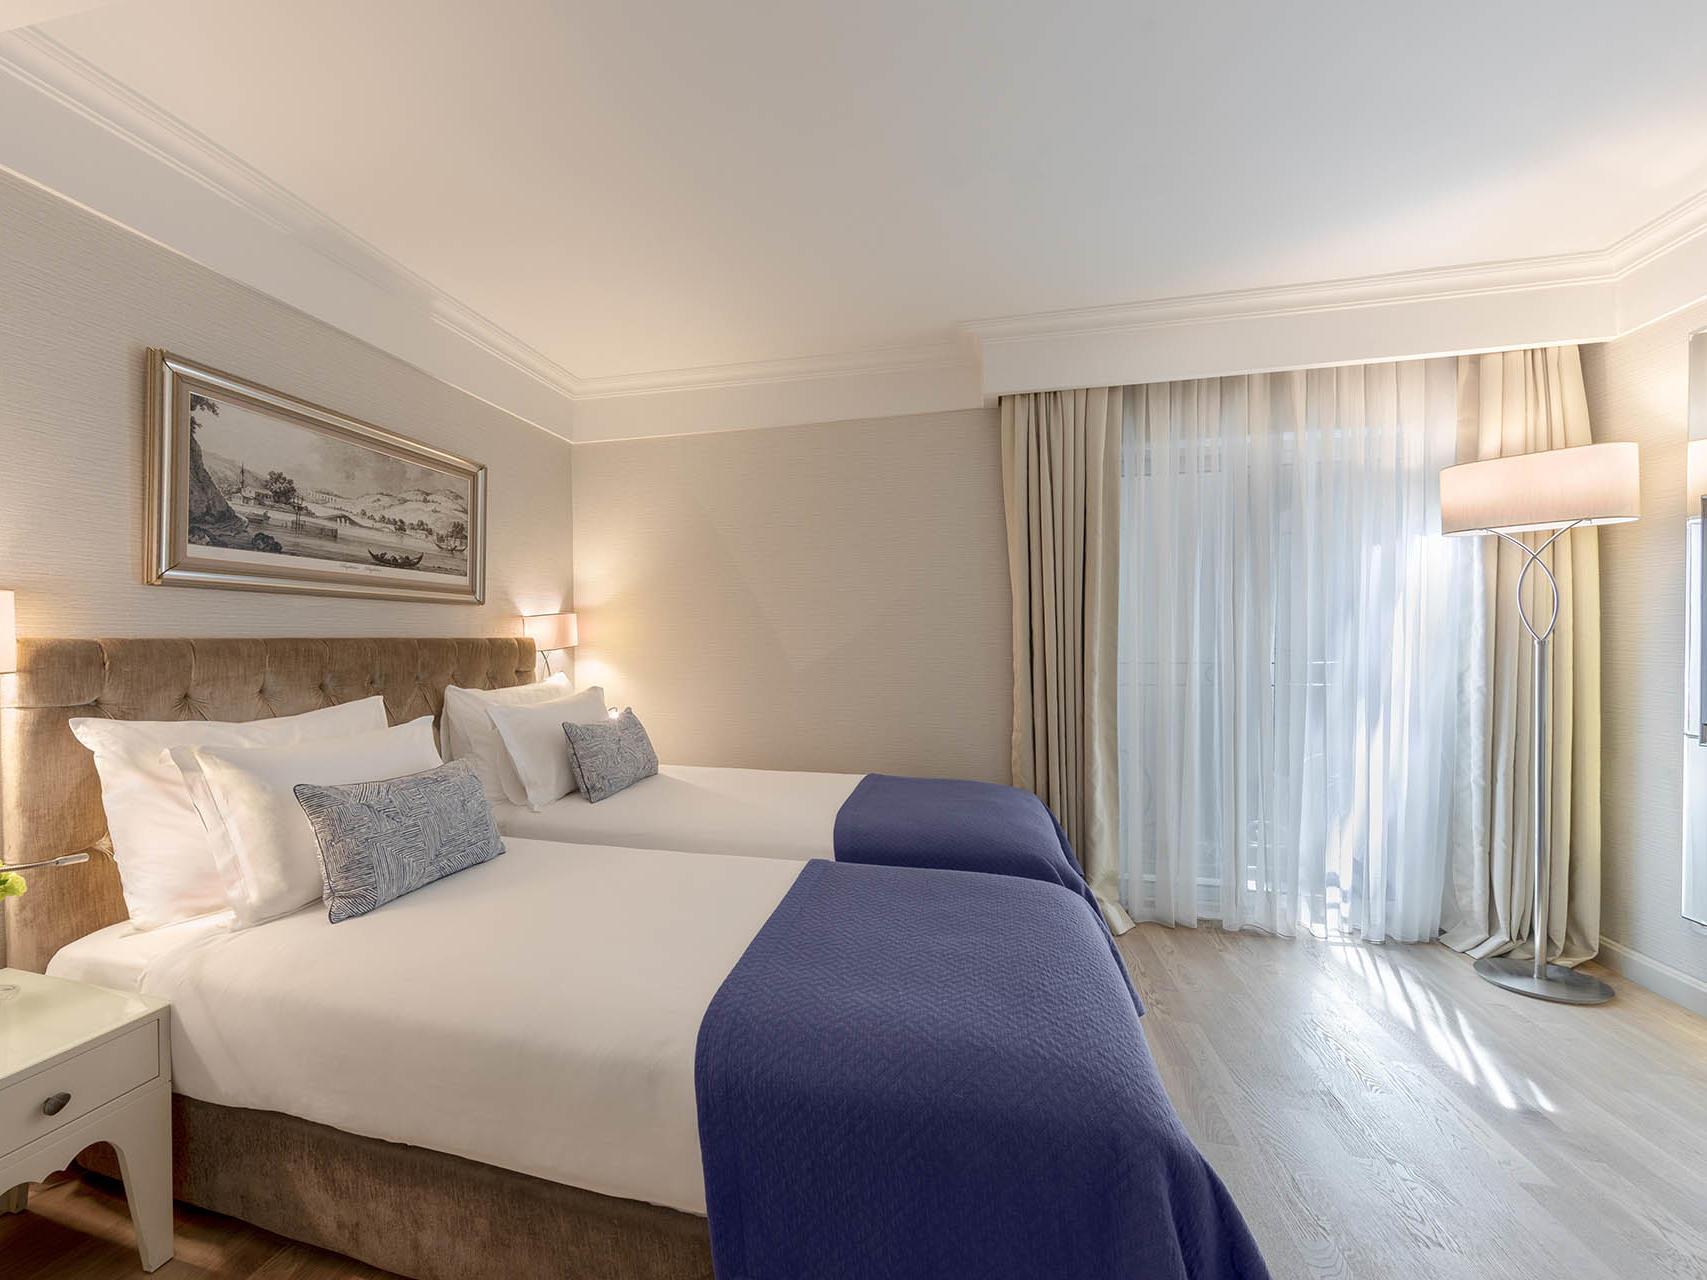 Standard room at CVK Hotels in Istanbul